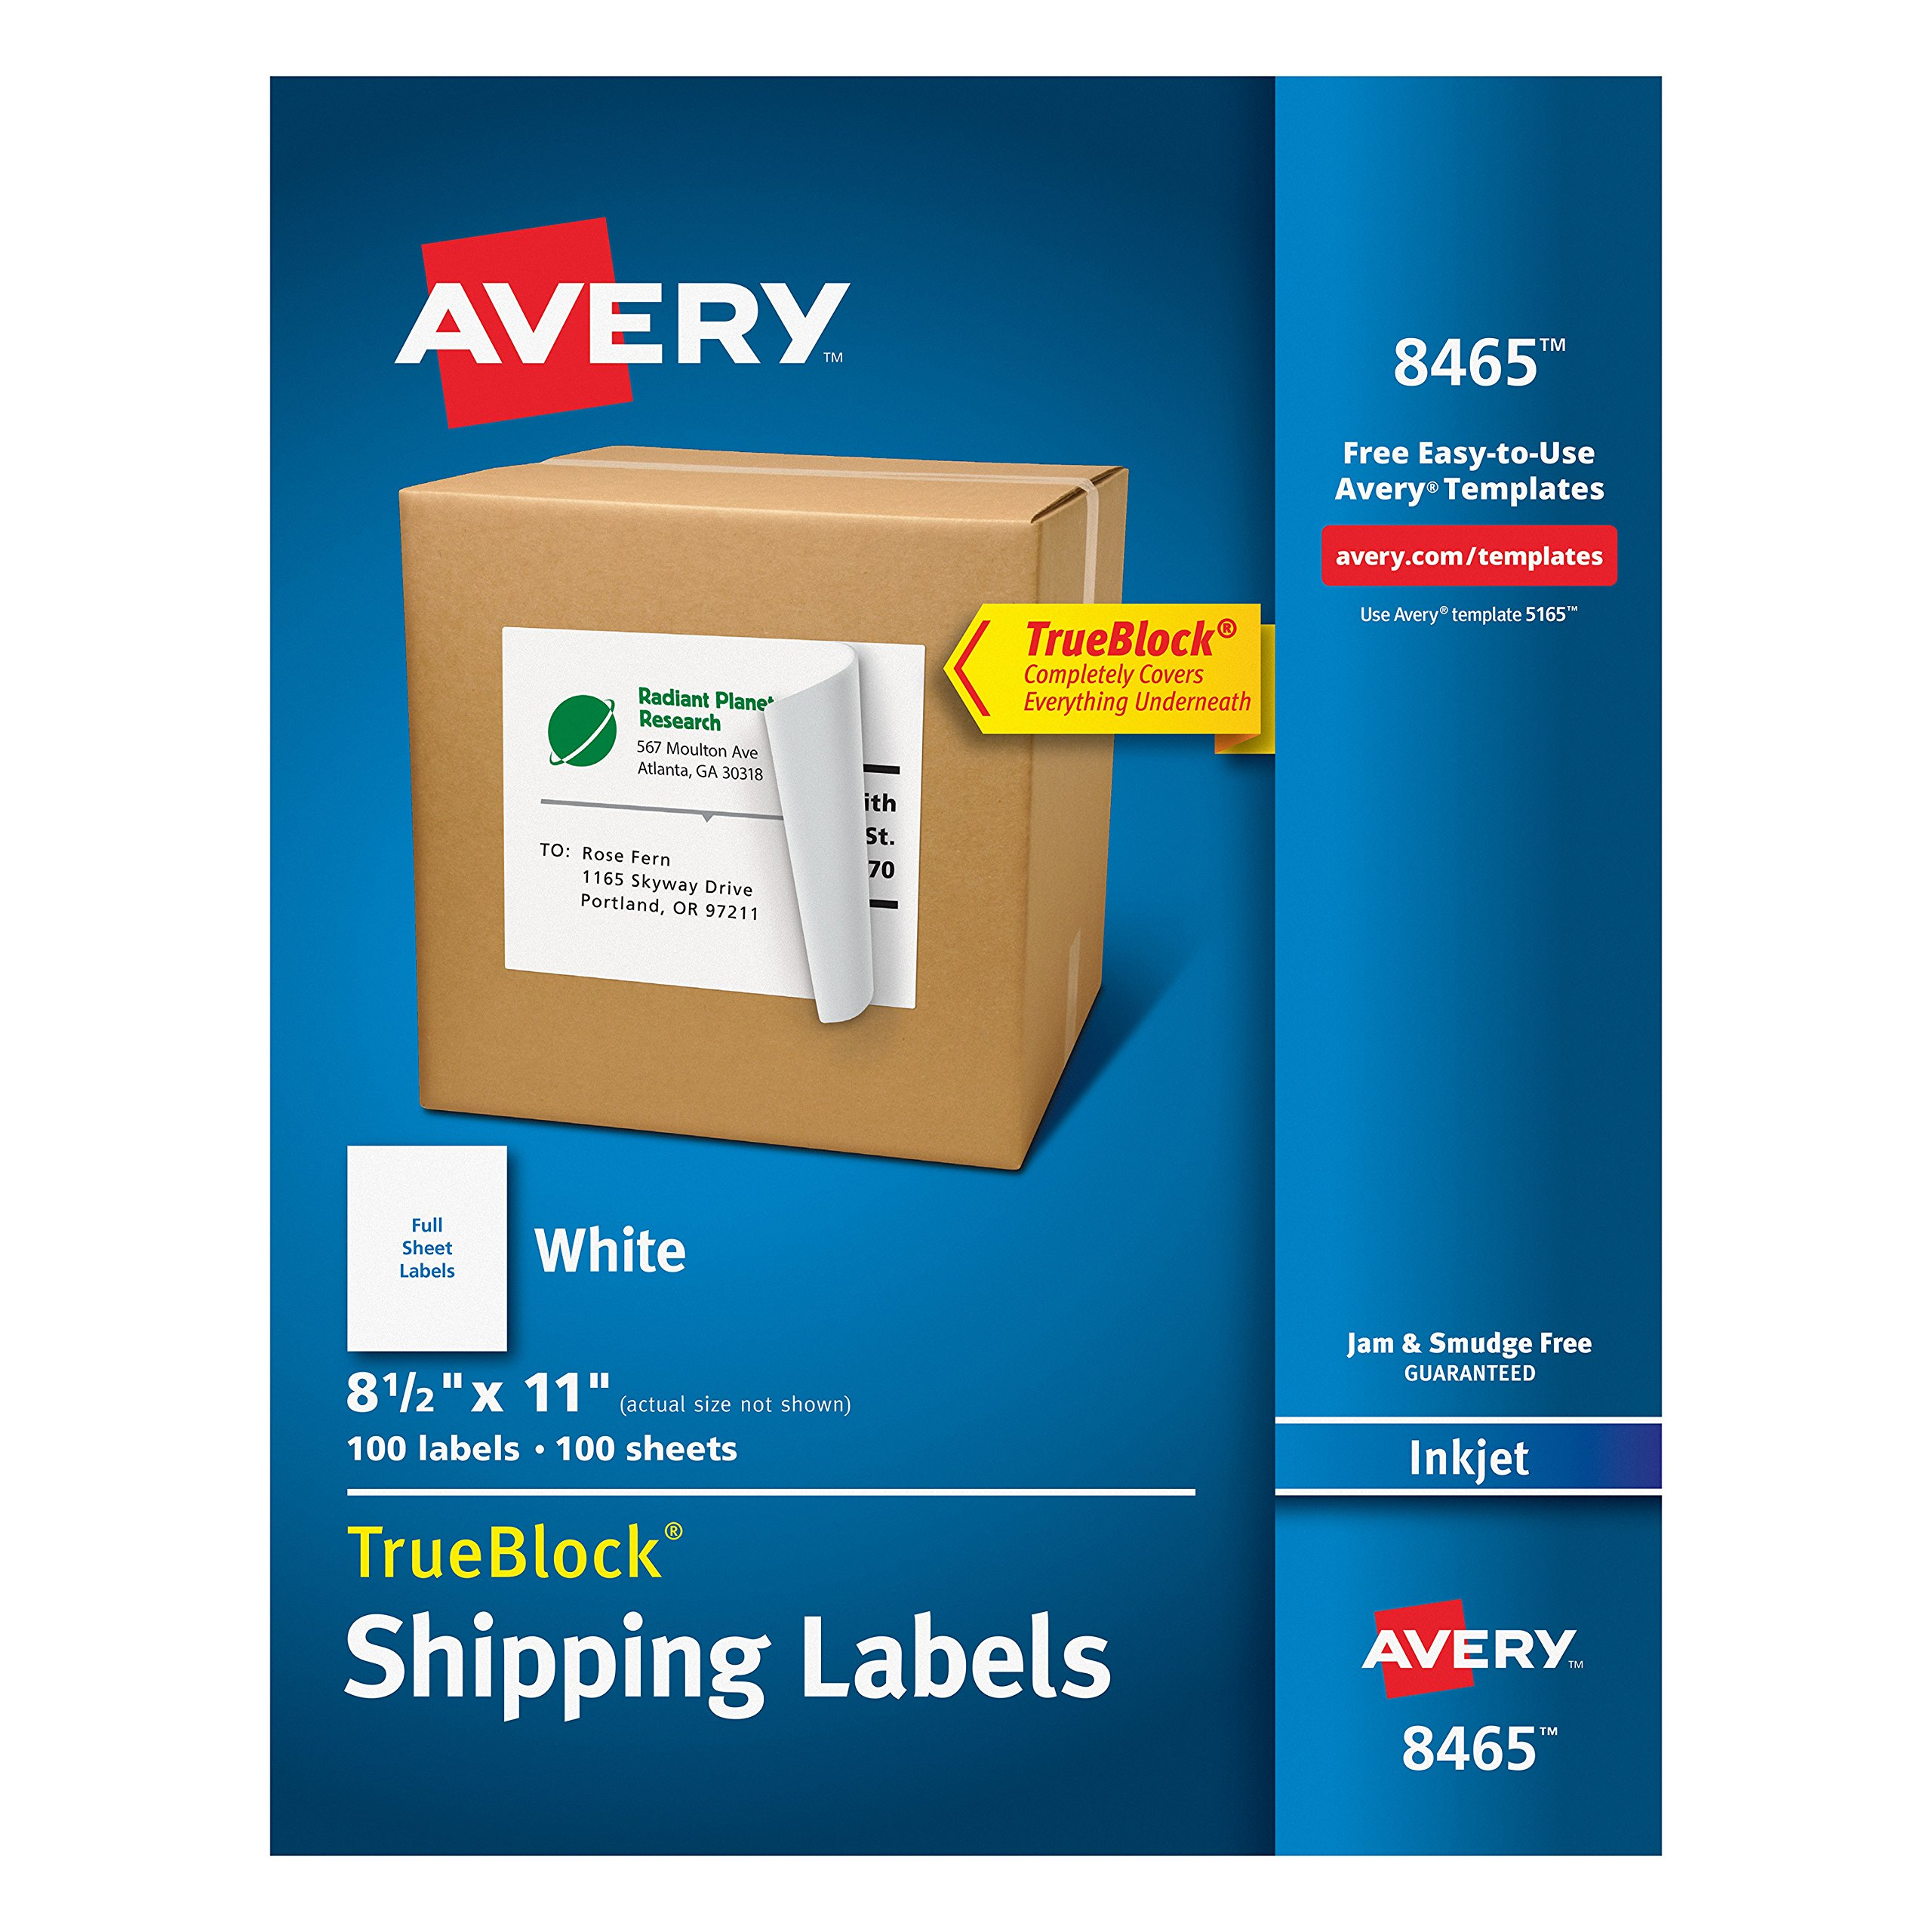 Avery Shipping Address Labels, Inkjet Printers, 100 Labels, Full Sheet Labels, Permanent Adhesive, TrueBlock (8465)